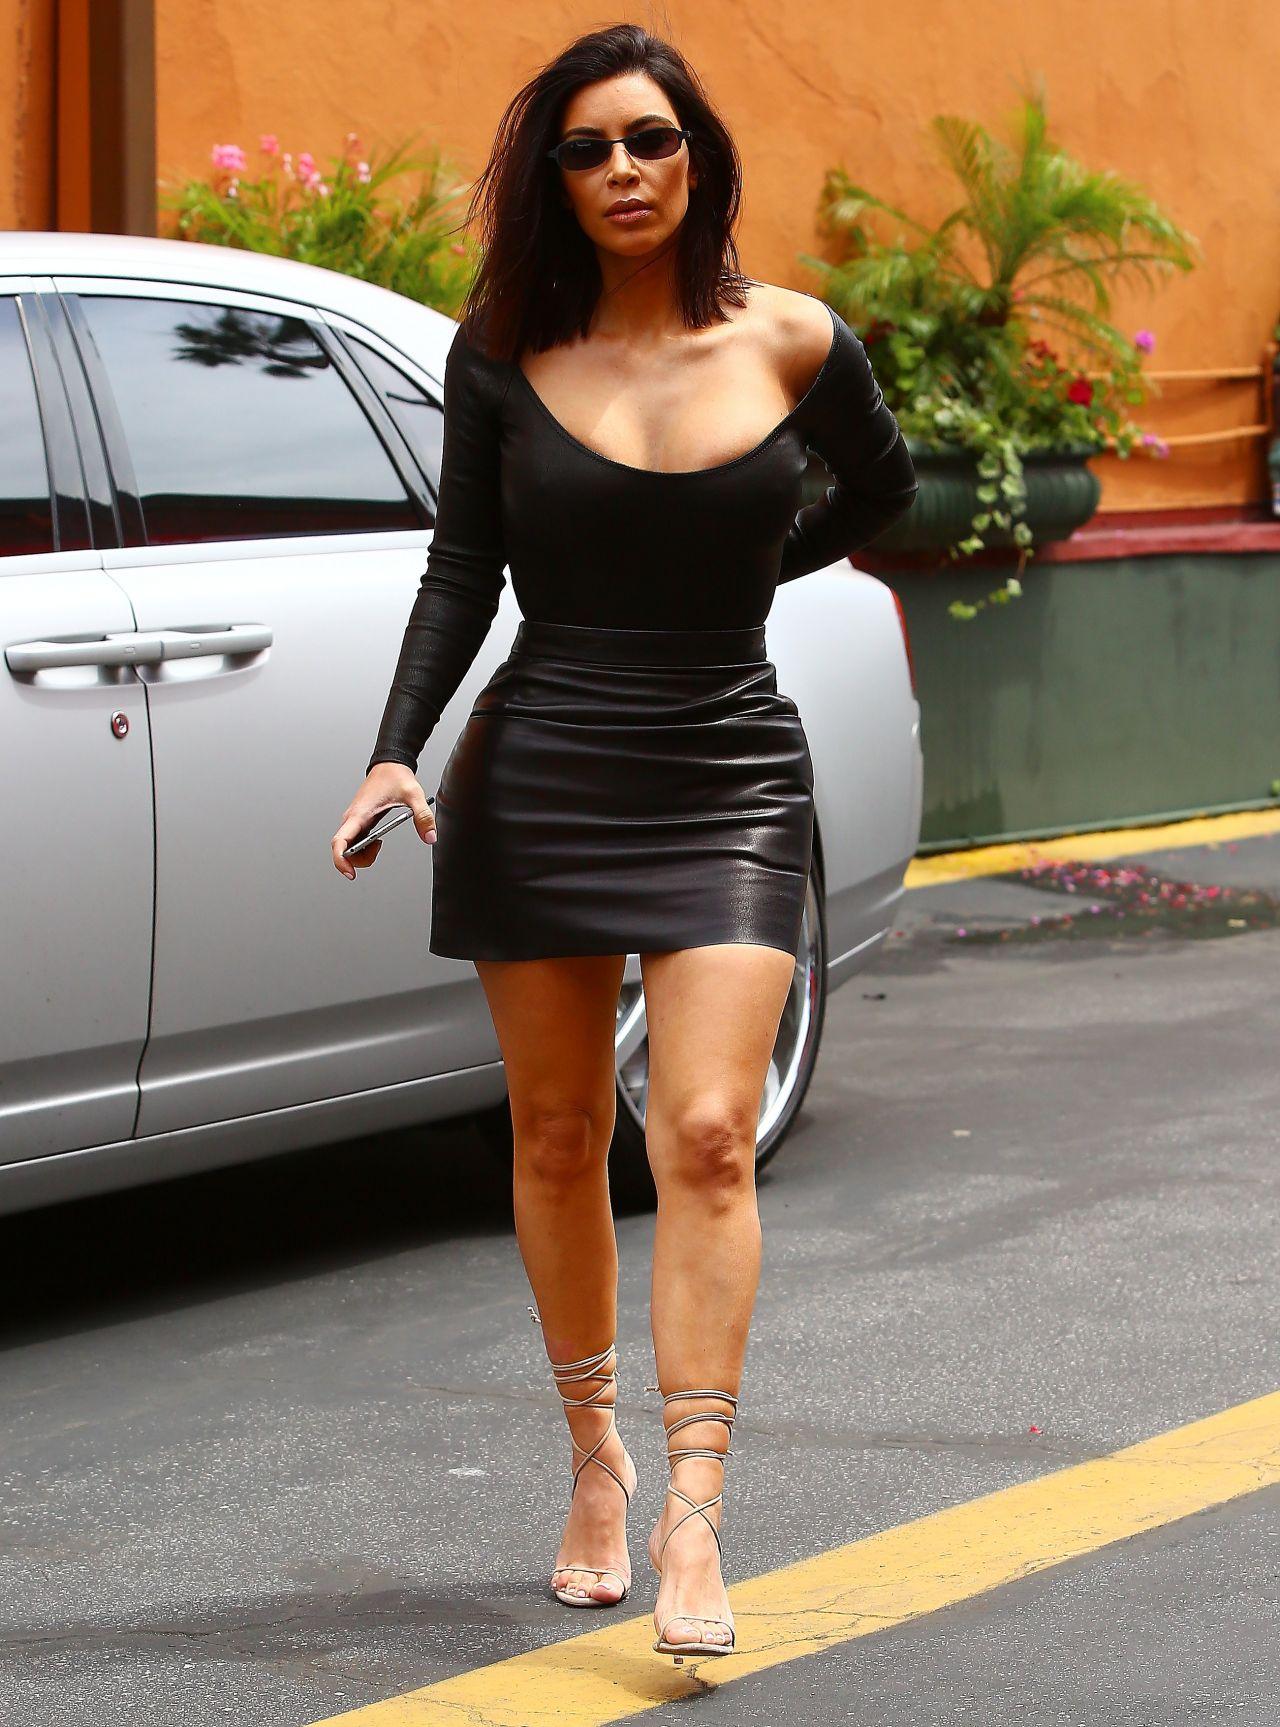 Kim Kardashian West looks stunning in a skin tight yellow